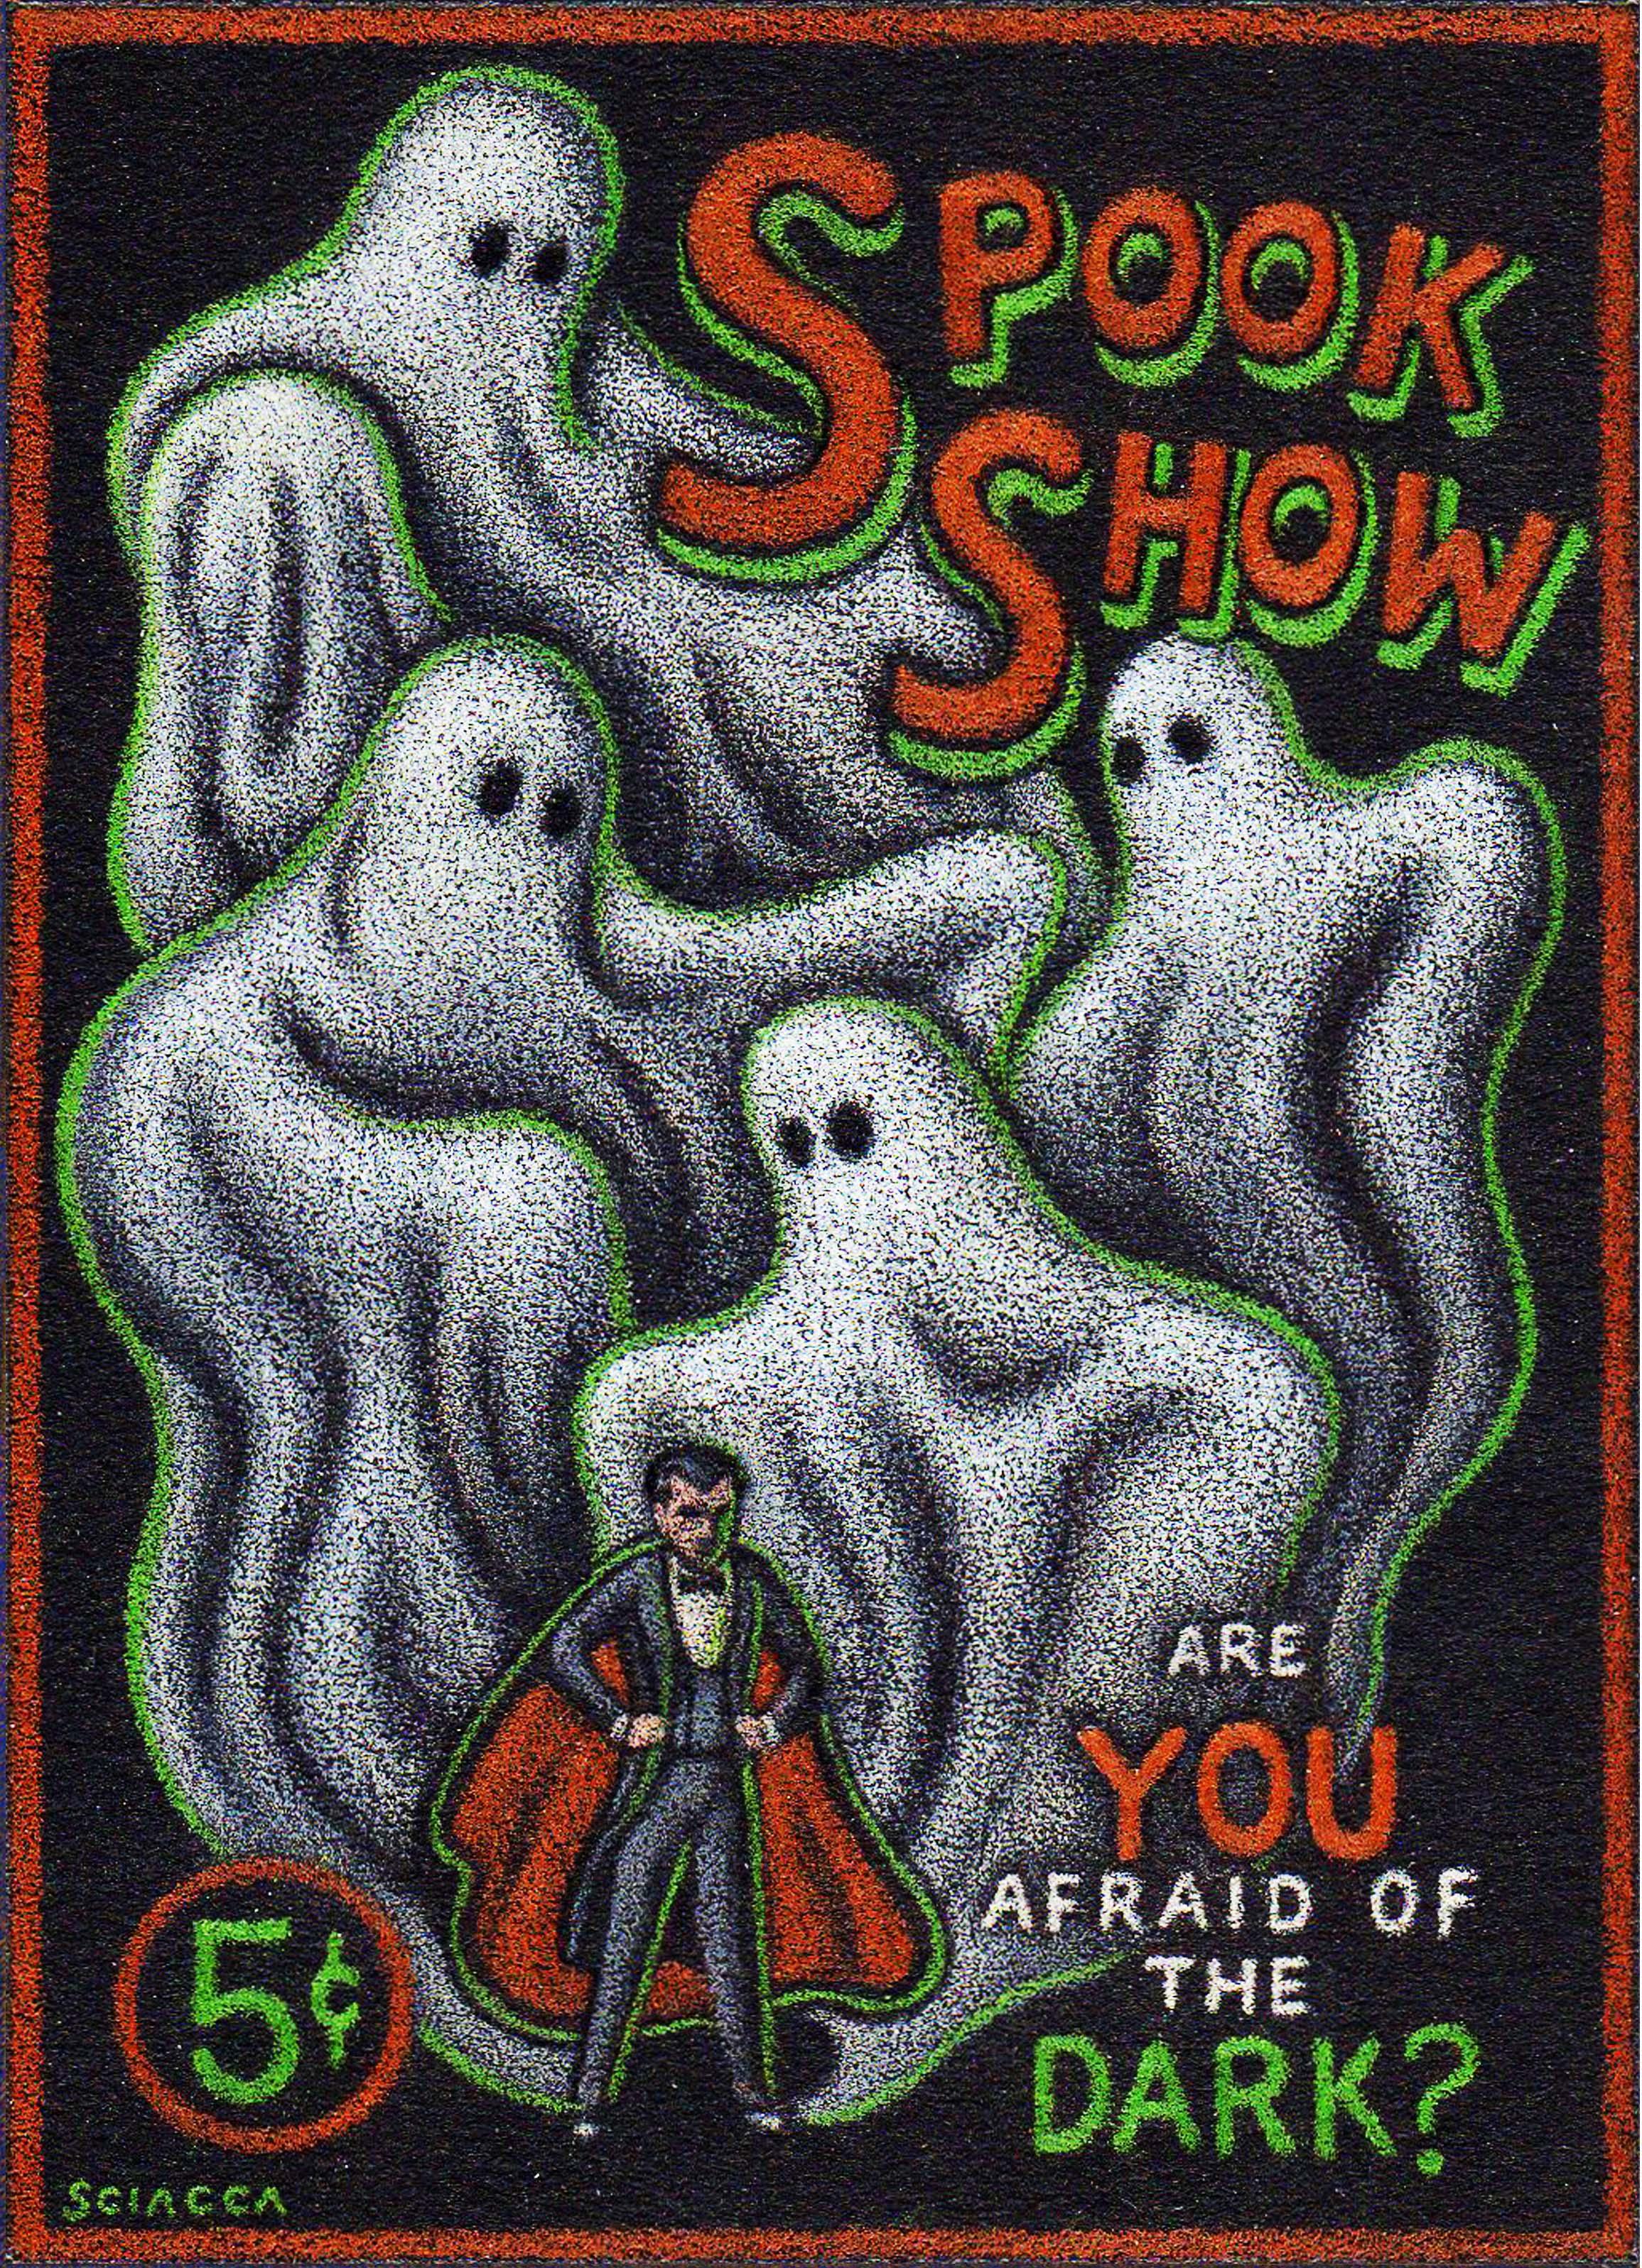 Spook Show 8x10.jpg